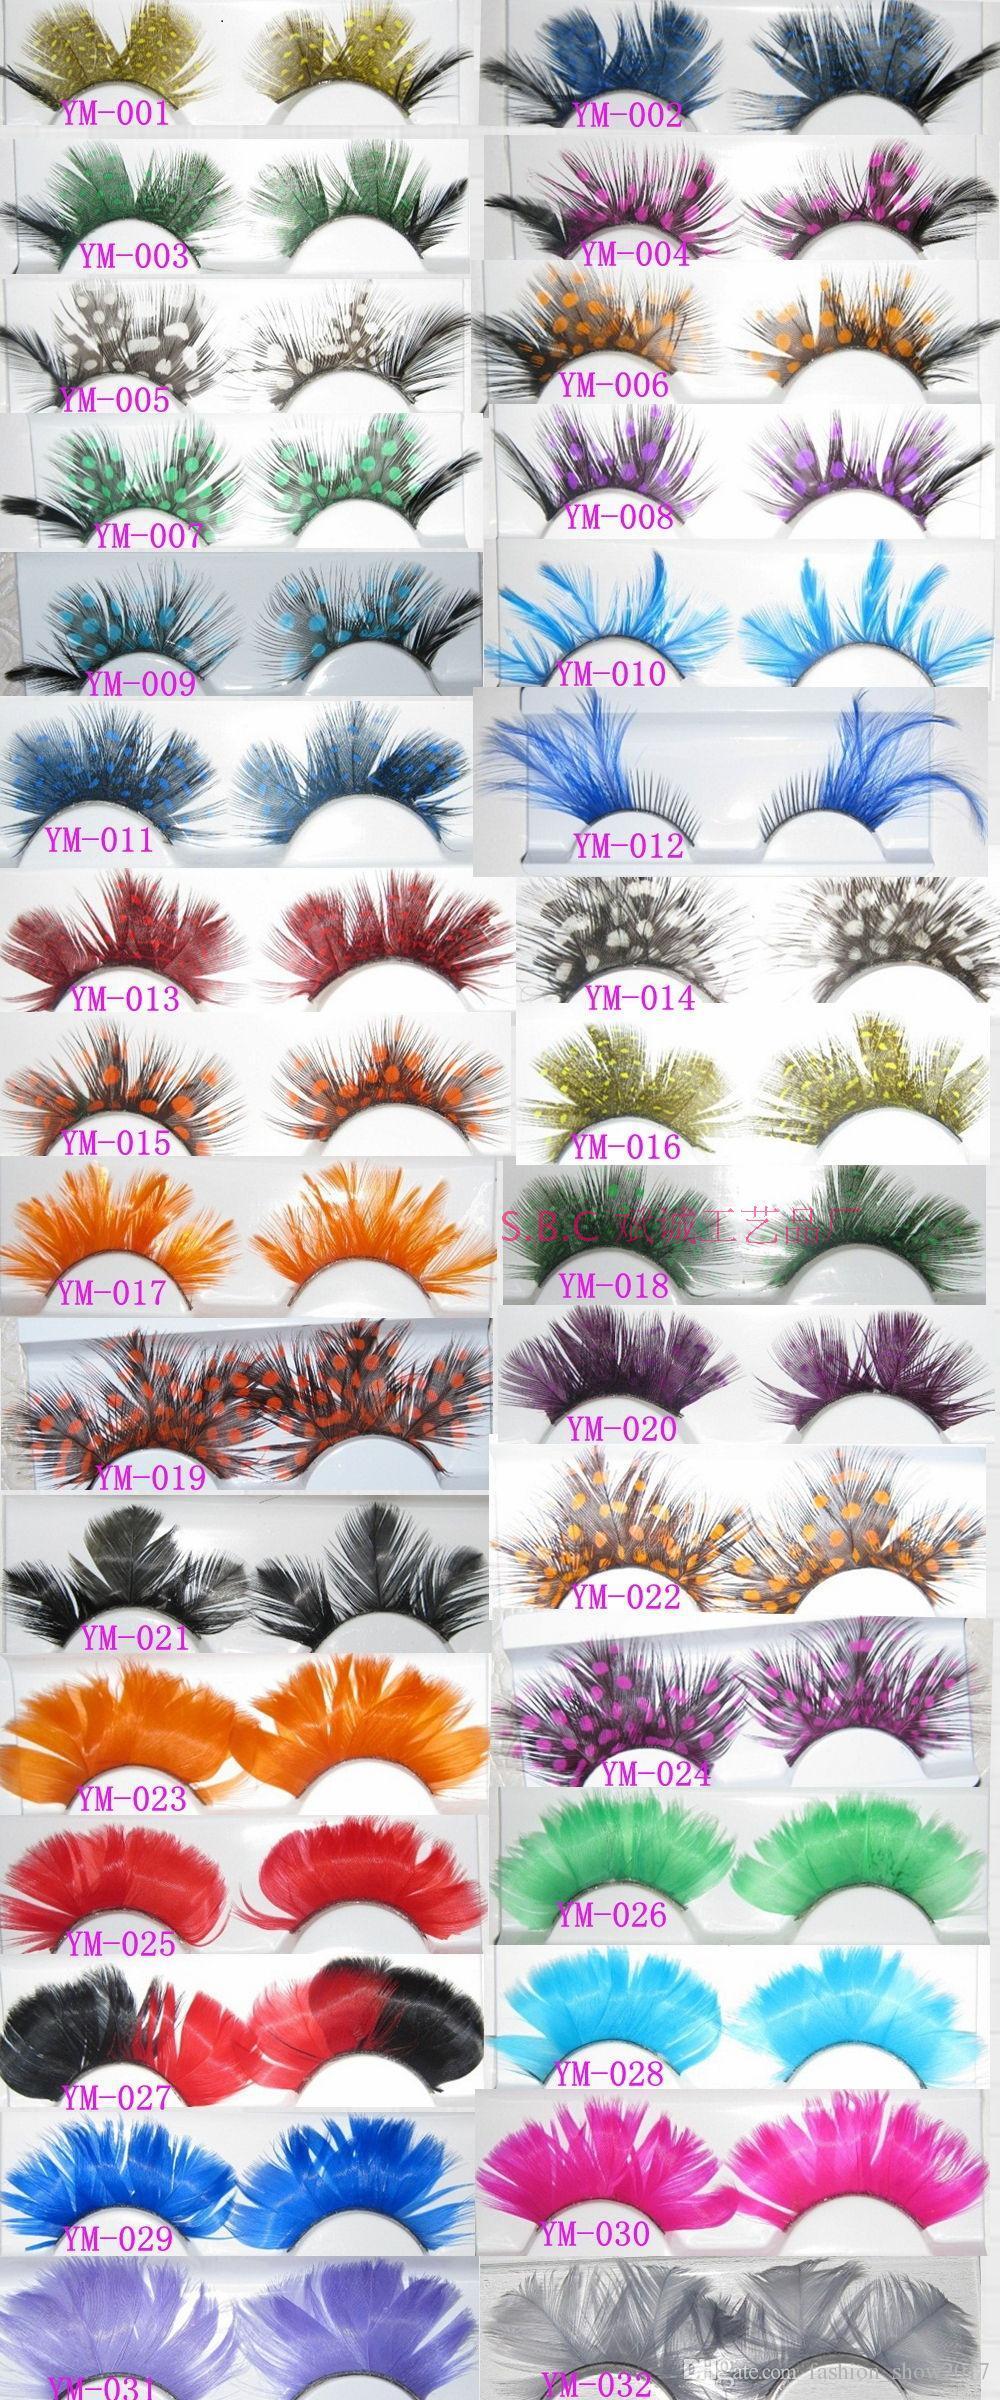 Colorful Feather False Eyelashes for Party makeup or Exaggerated Maquiagem White Spots Feather Eyelashes